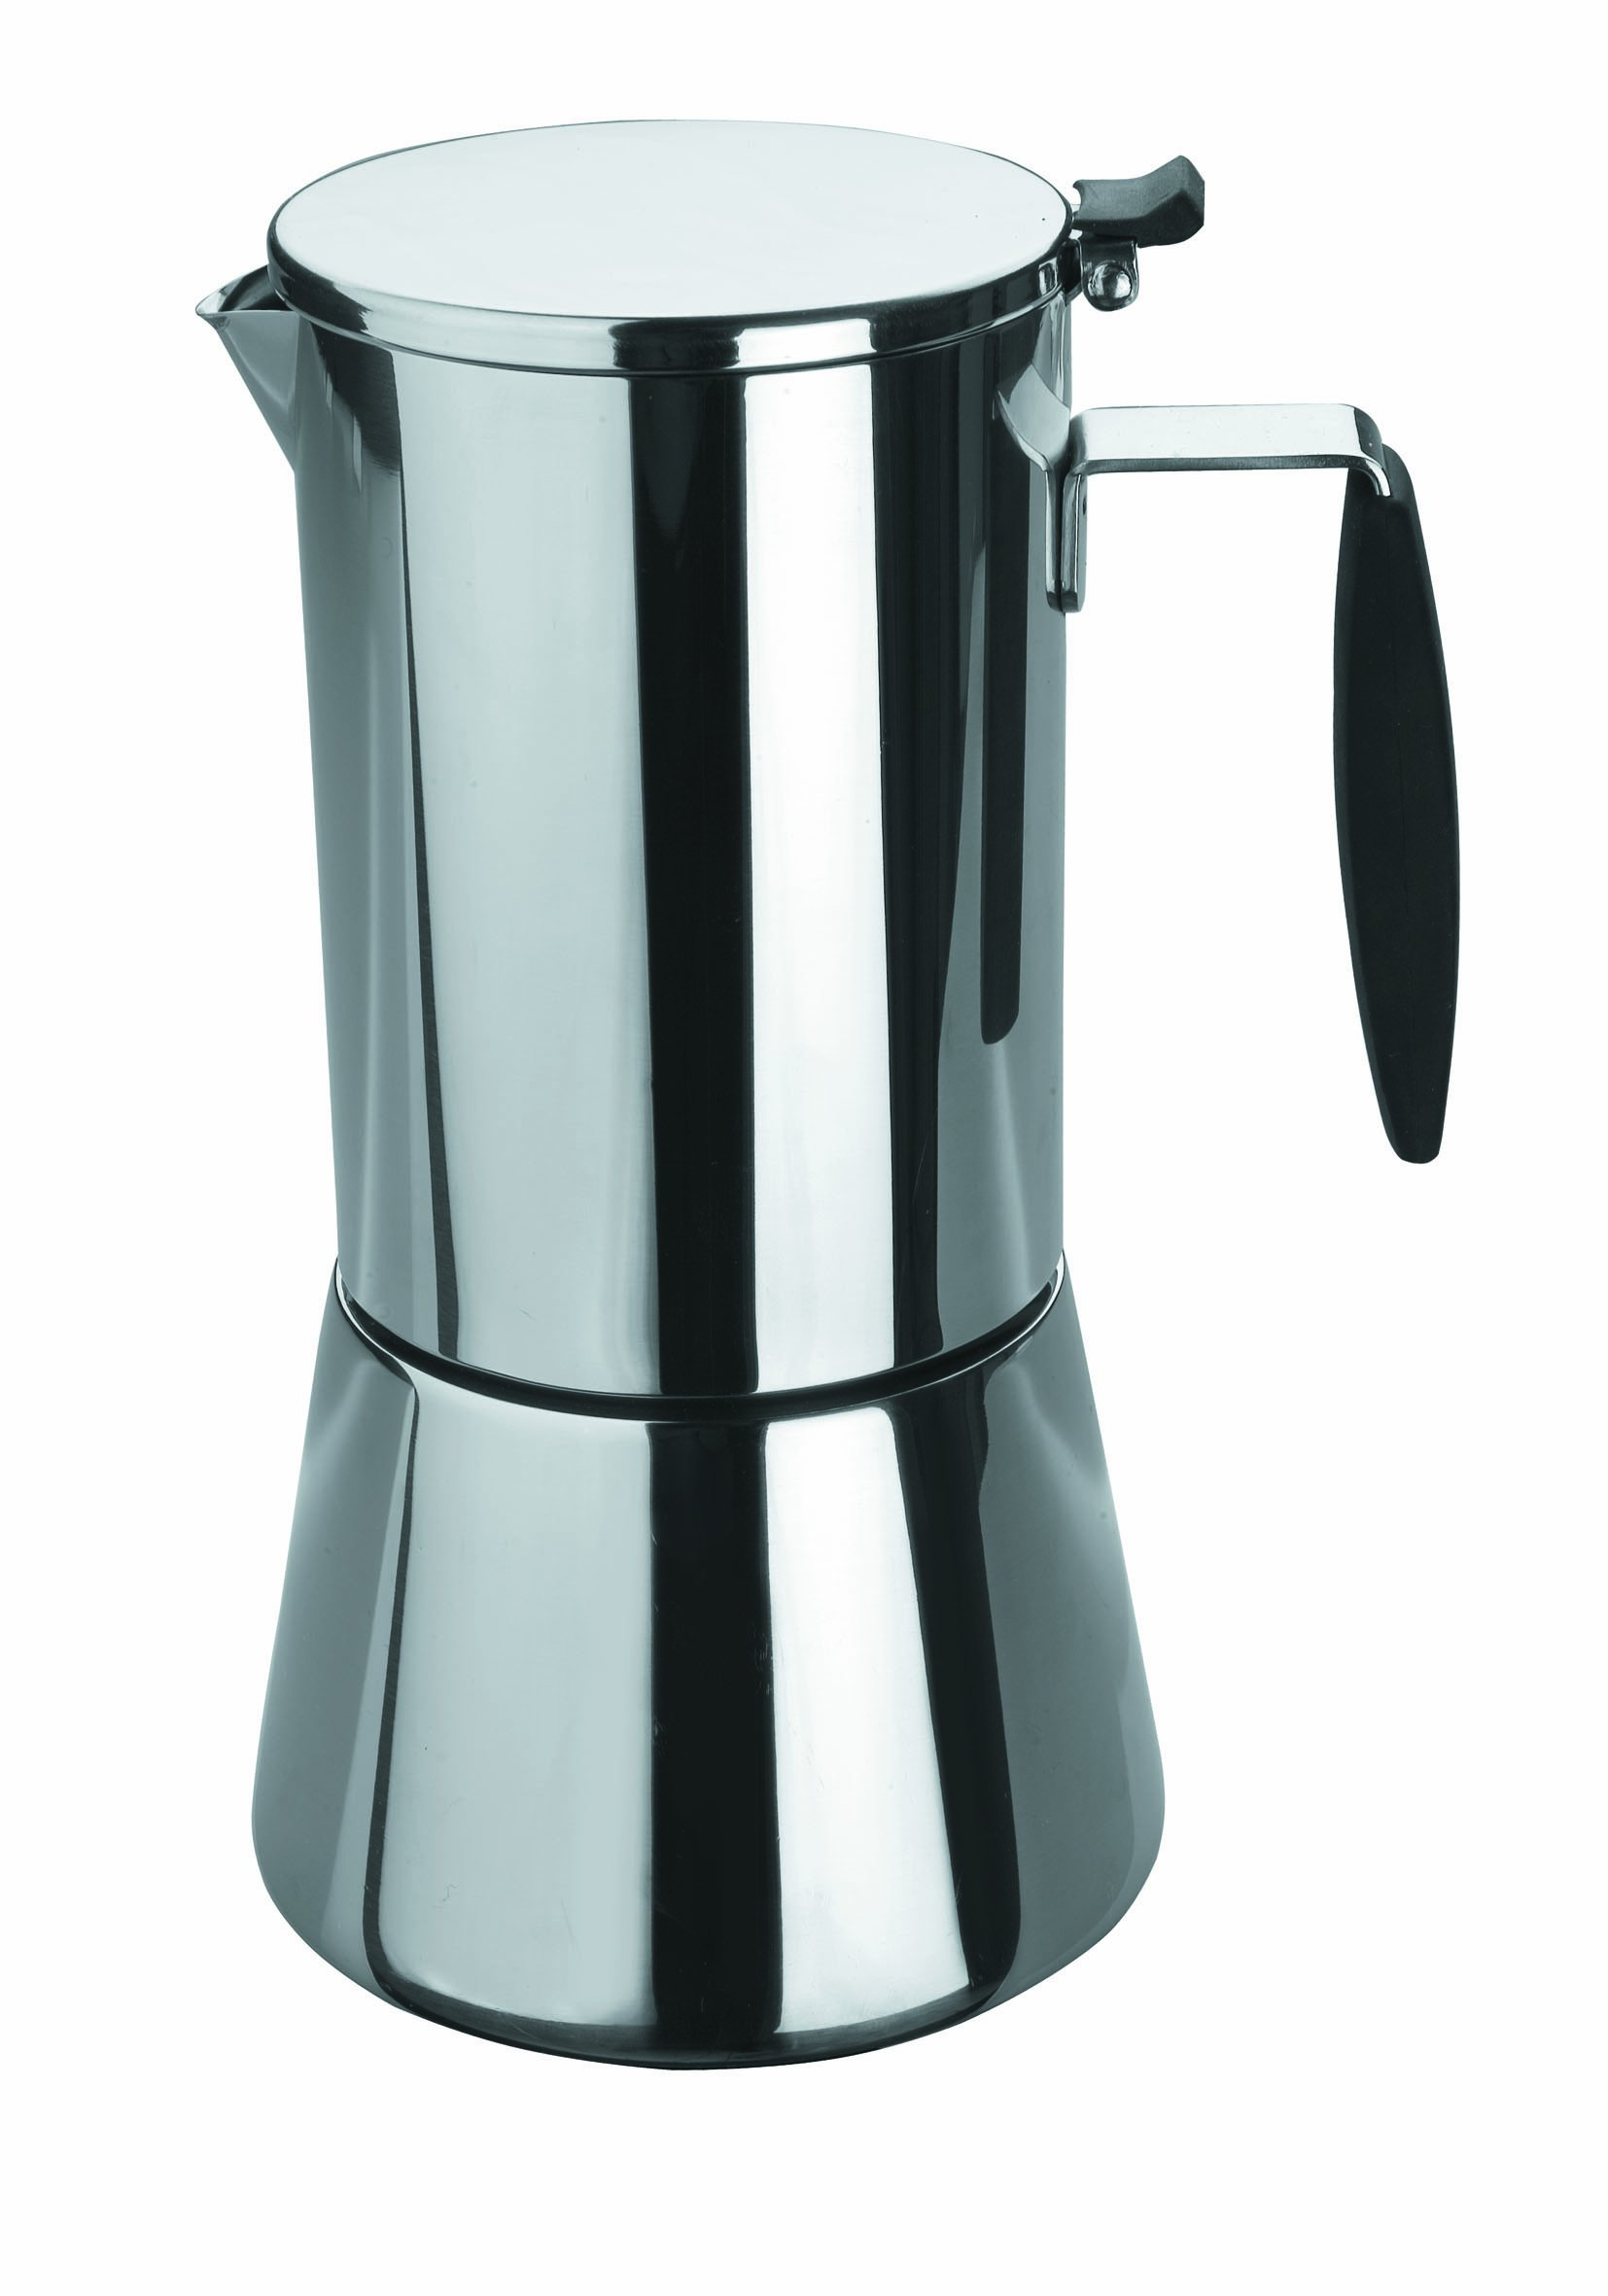 Lacor 62061 - Cafetera express keita 10 taza inox18/10: Amazon.es: Hogar